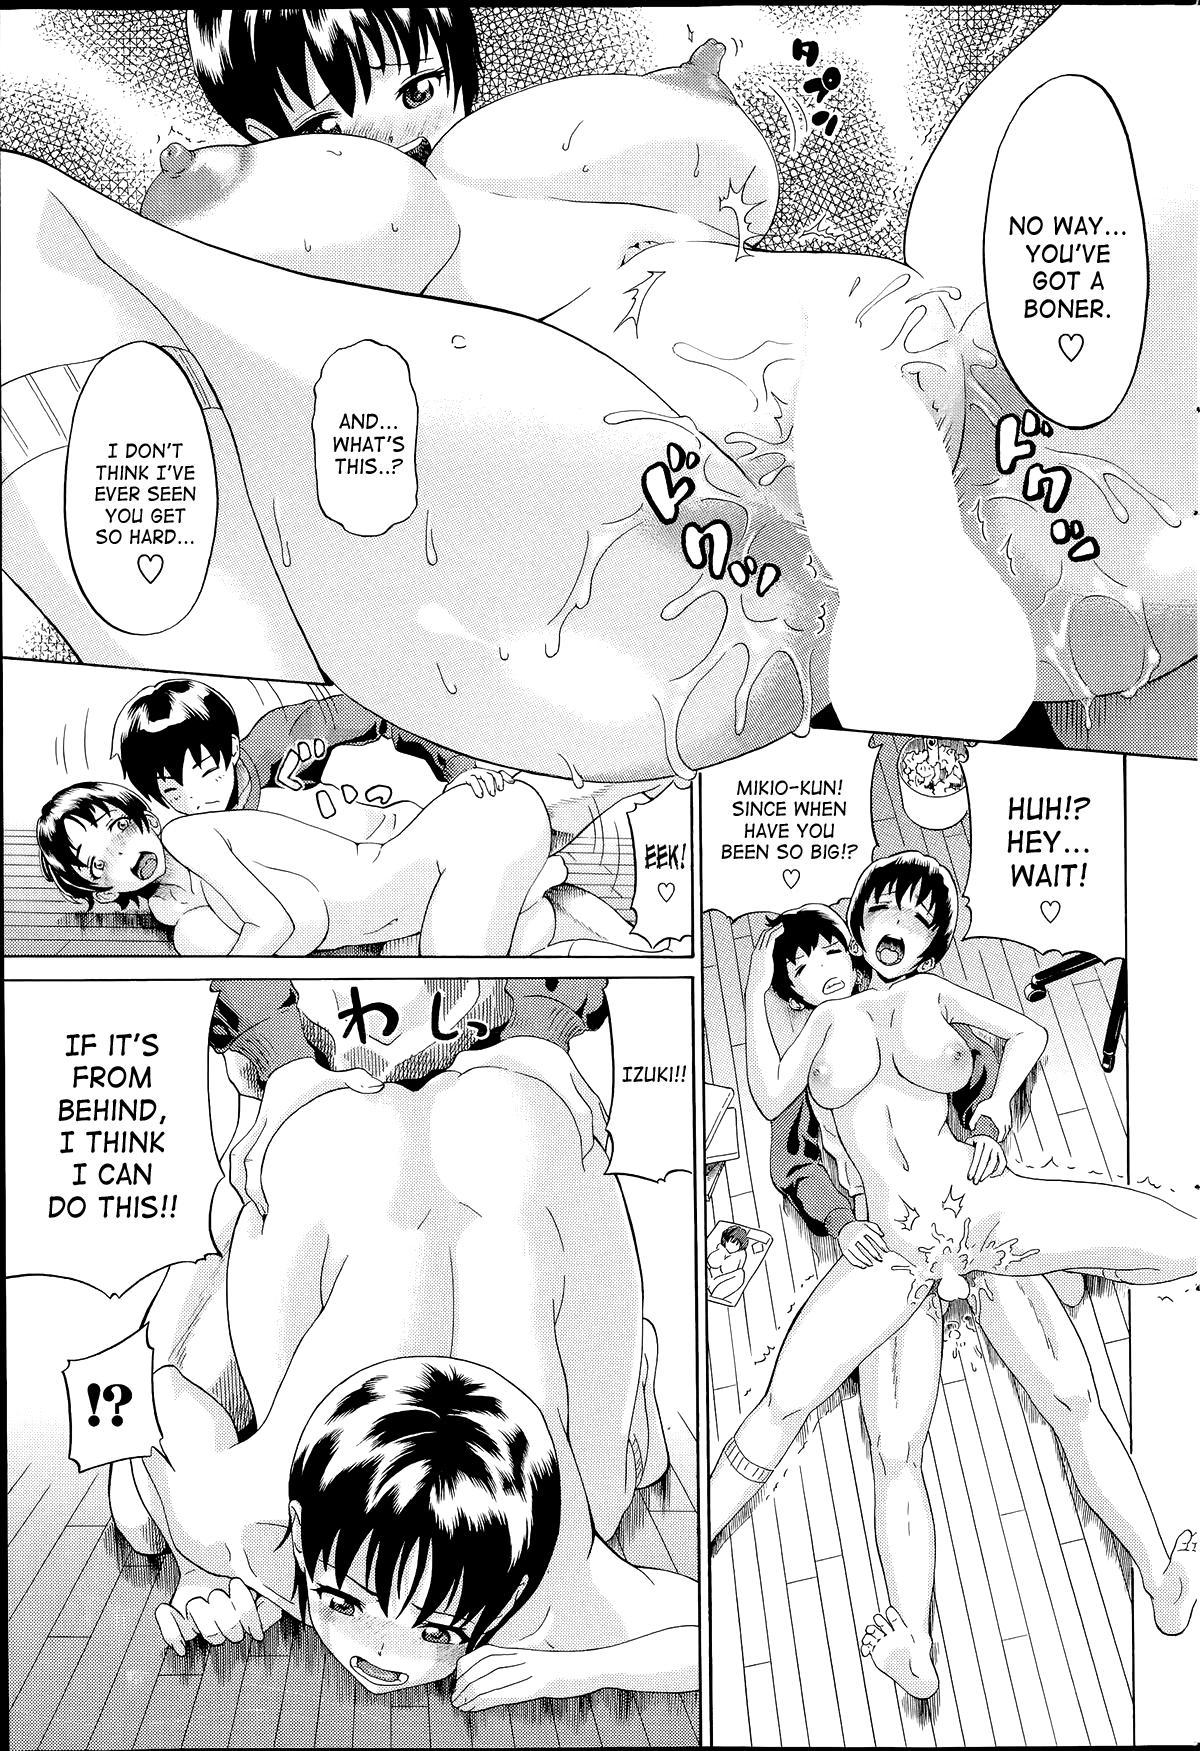 Chichi wa Kakusazu Shiri Kakusei | Without Hiding Your Tits Butt Awakening 12